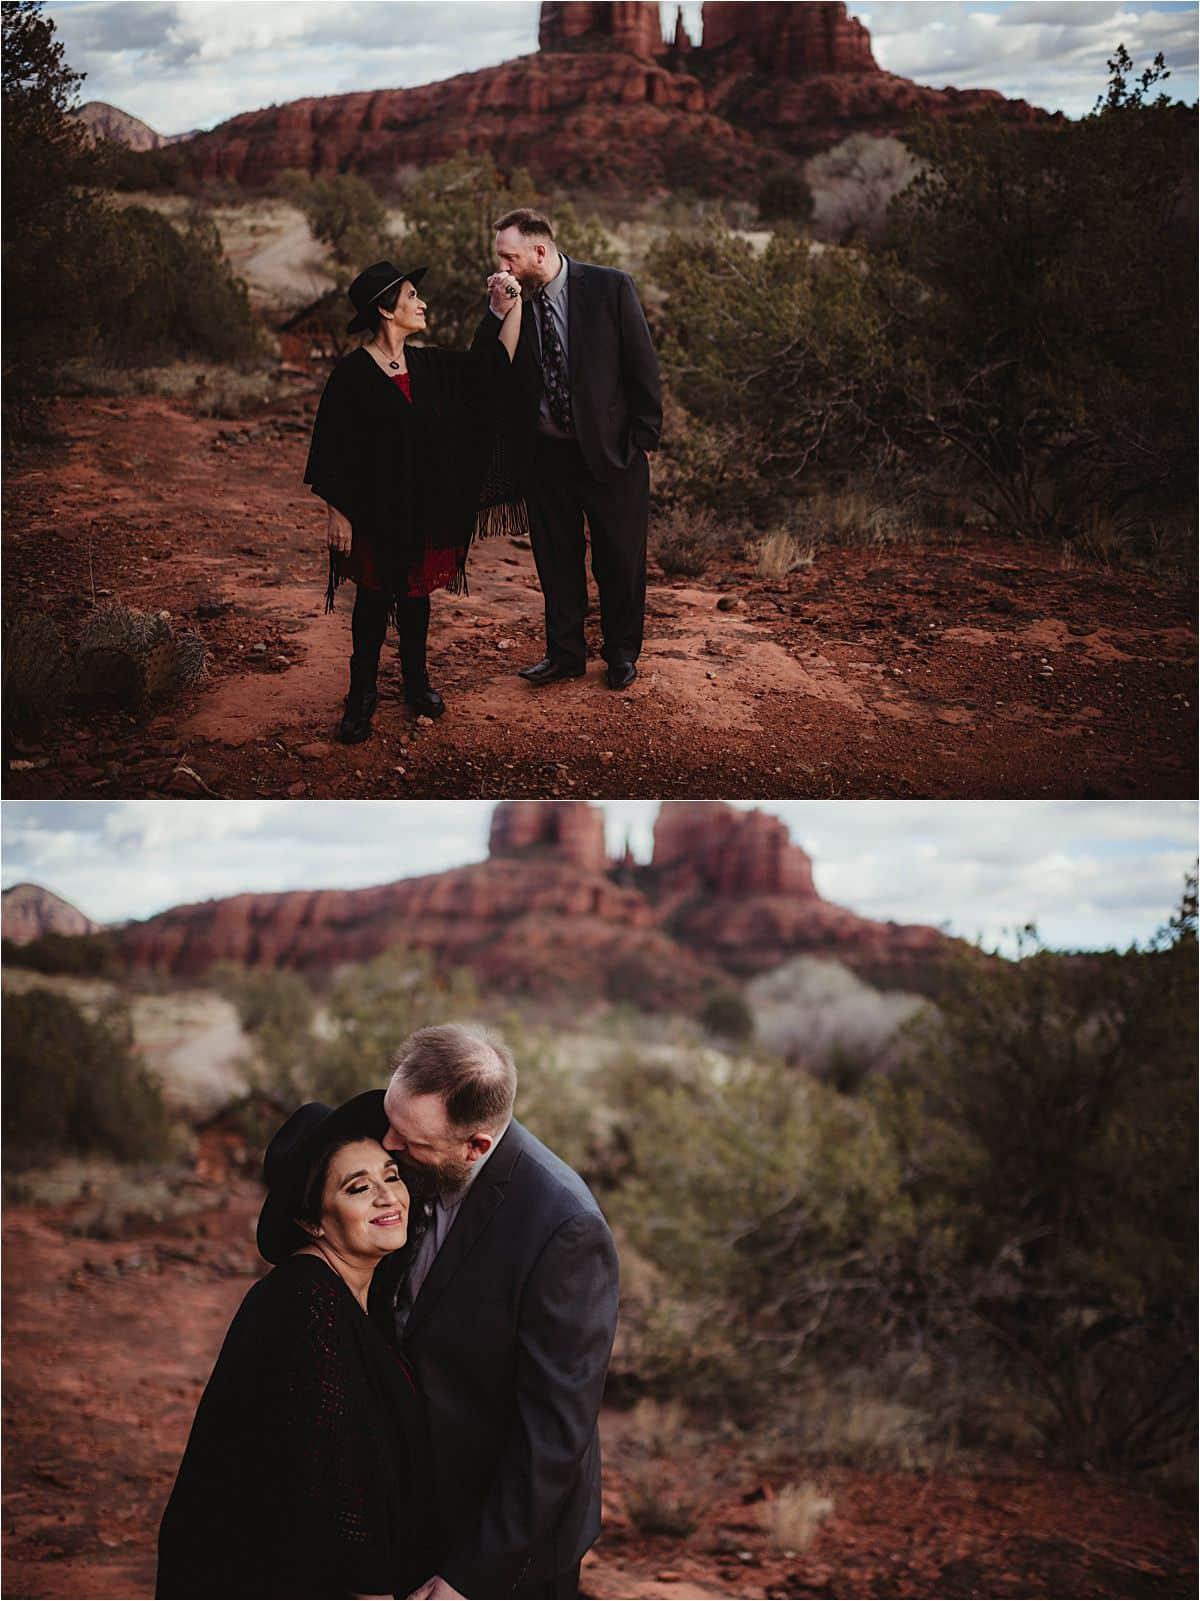 Couple Walking in Desert